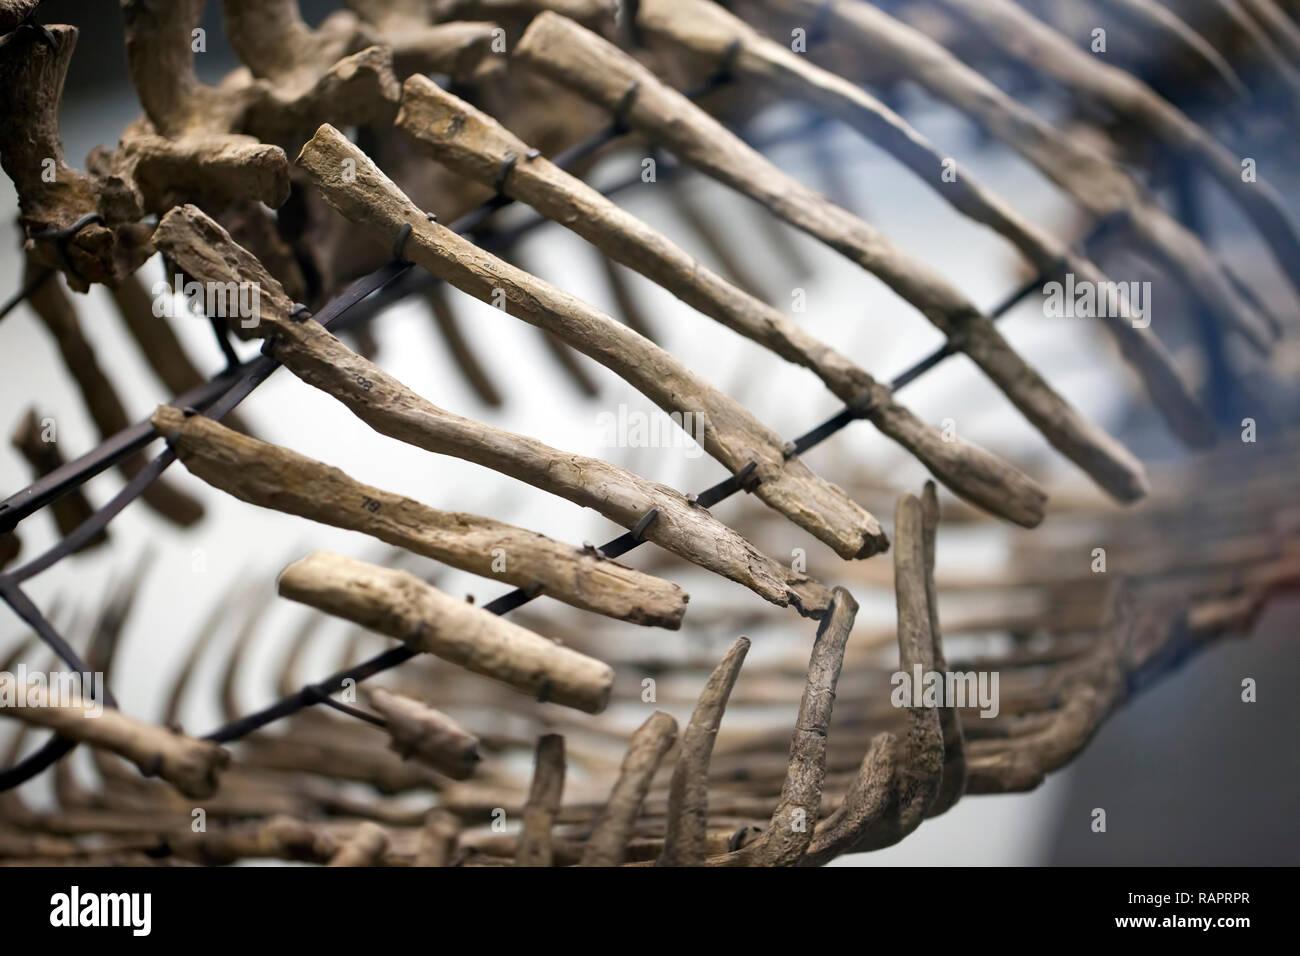 Ancient Prehistoric Dinosaur Skeleton Fossile Paleontology Science Concept - Stock Image